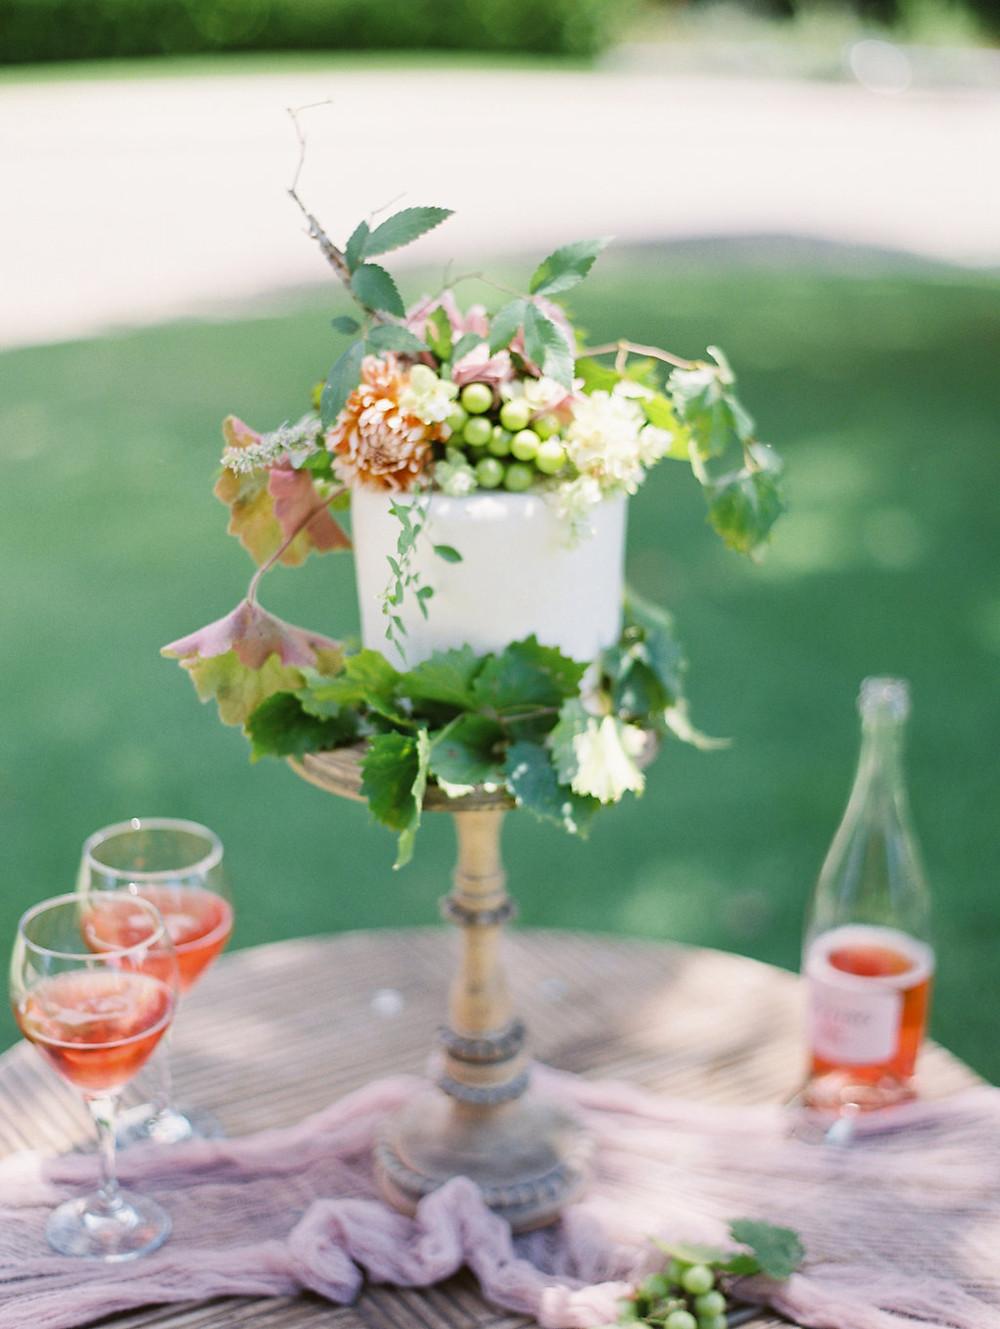 birmingham al wedding cake